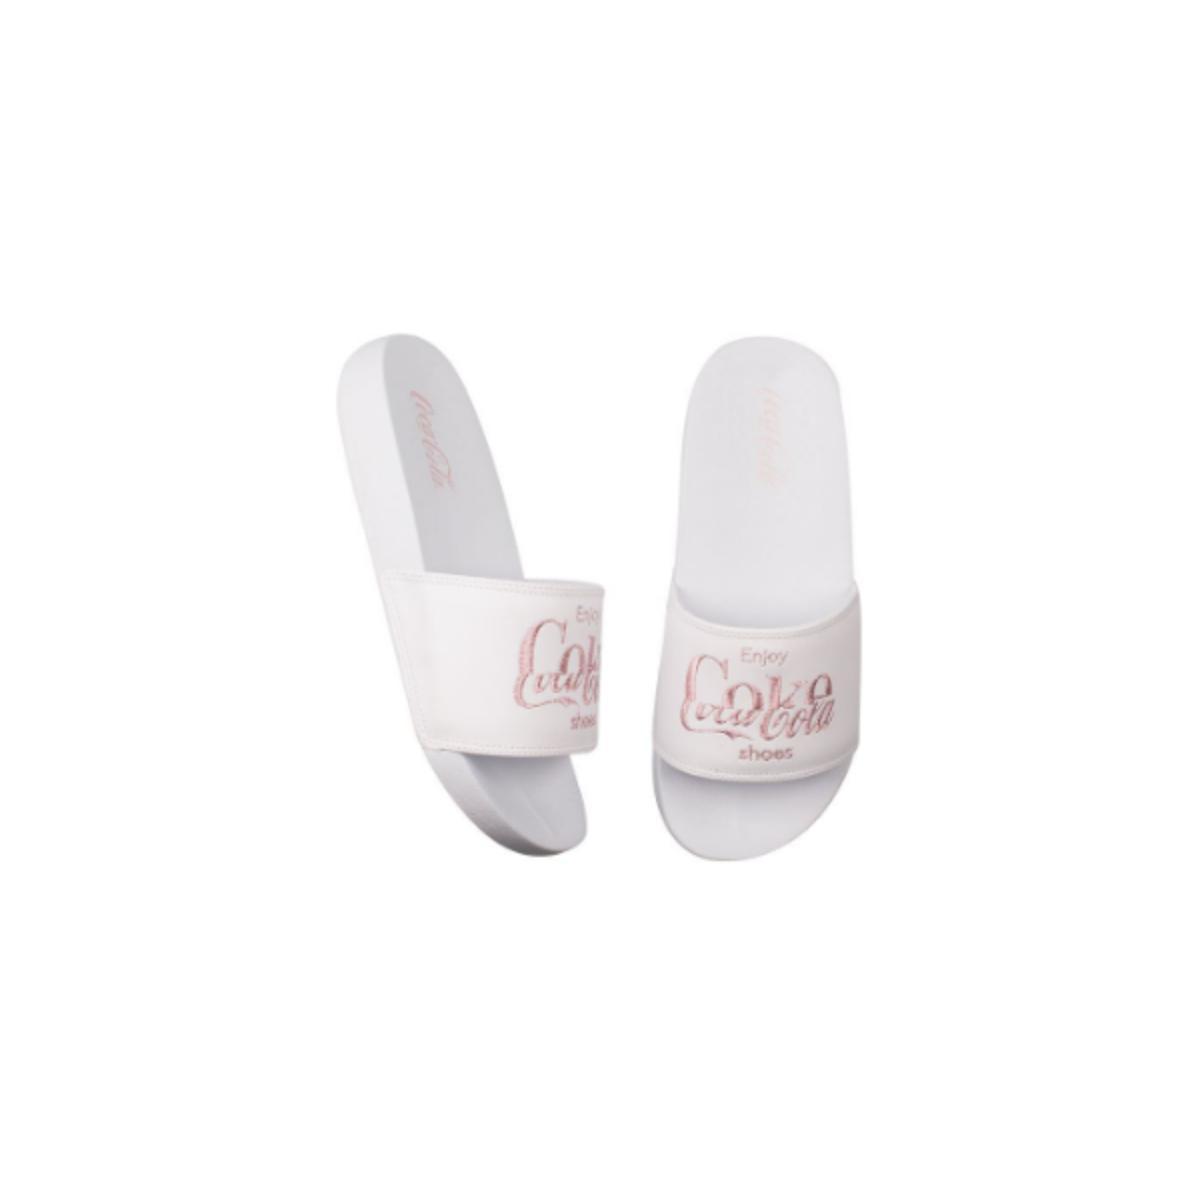 Chinelo Feminino Coca-cola Shoes Cc3158 Branco